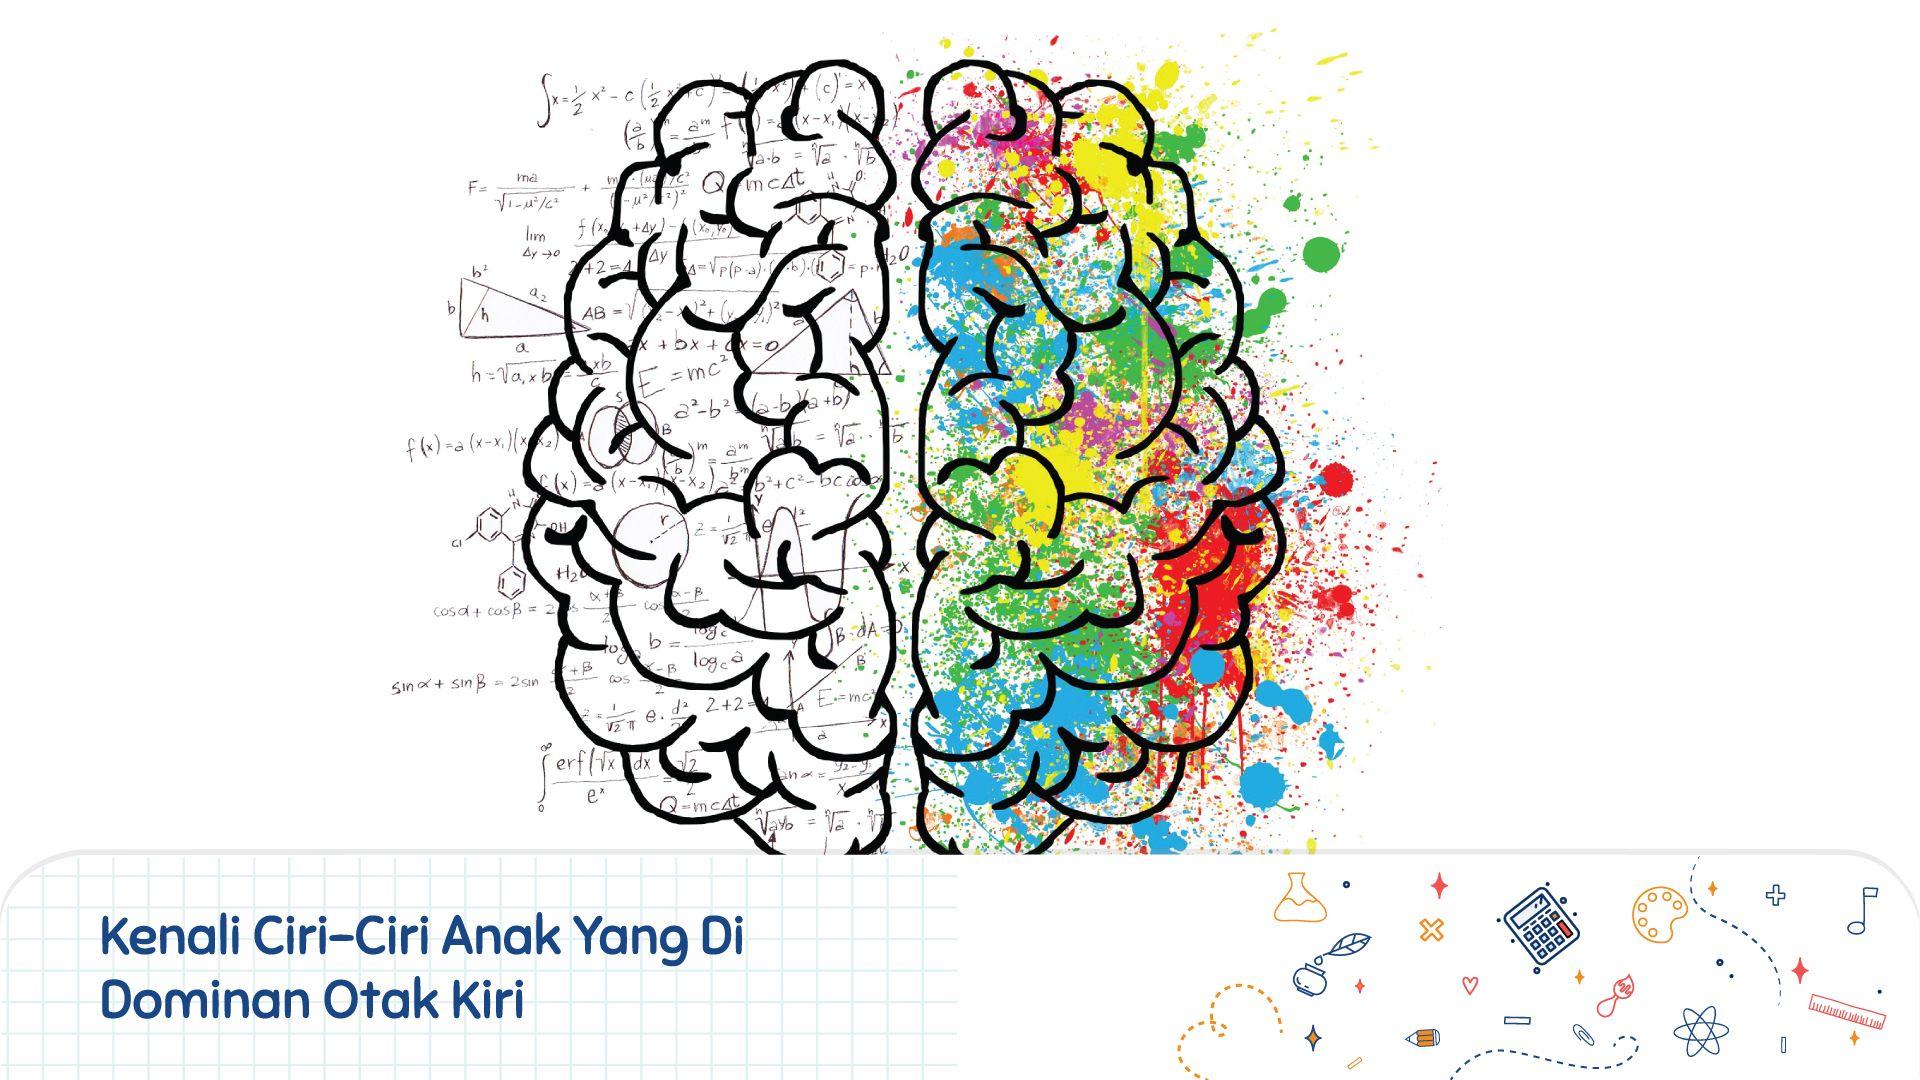 Kenali Ciri Ciri Anak Yang Di Dominan Otak Kiri Pola Otak Kanan Sekolah